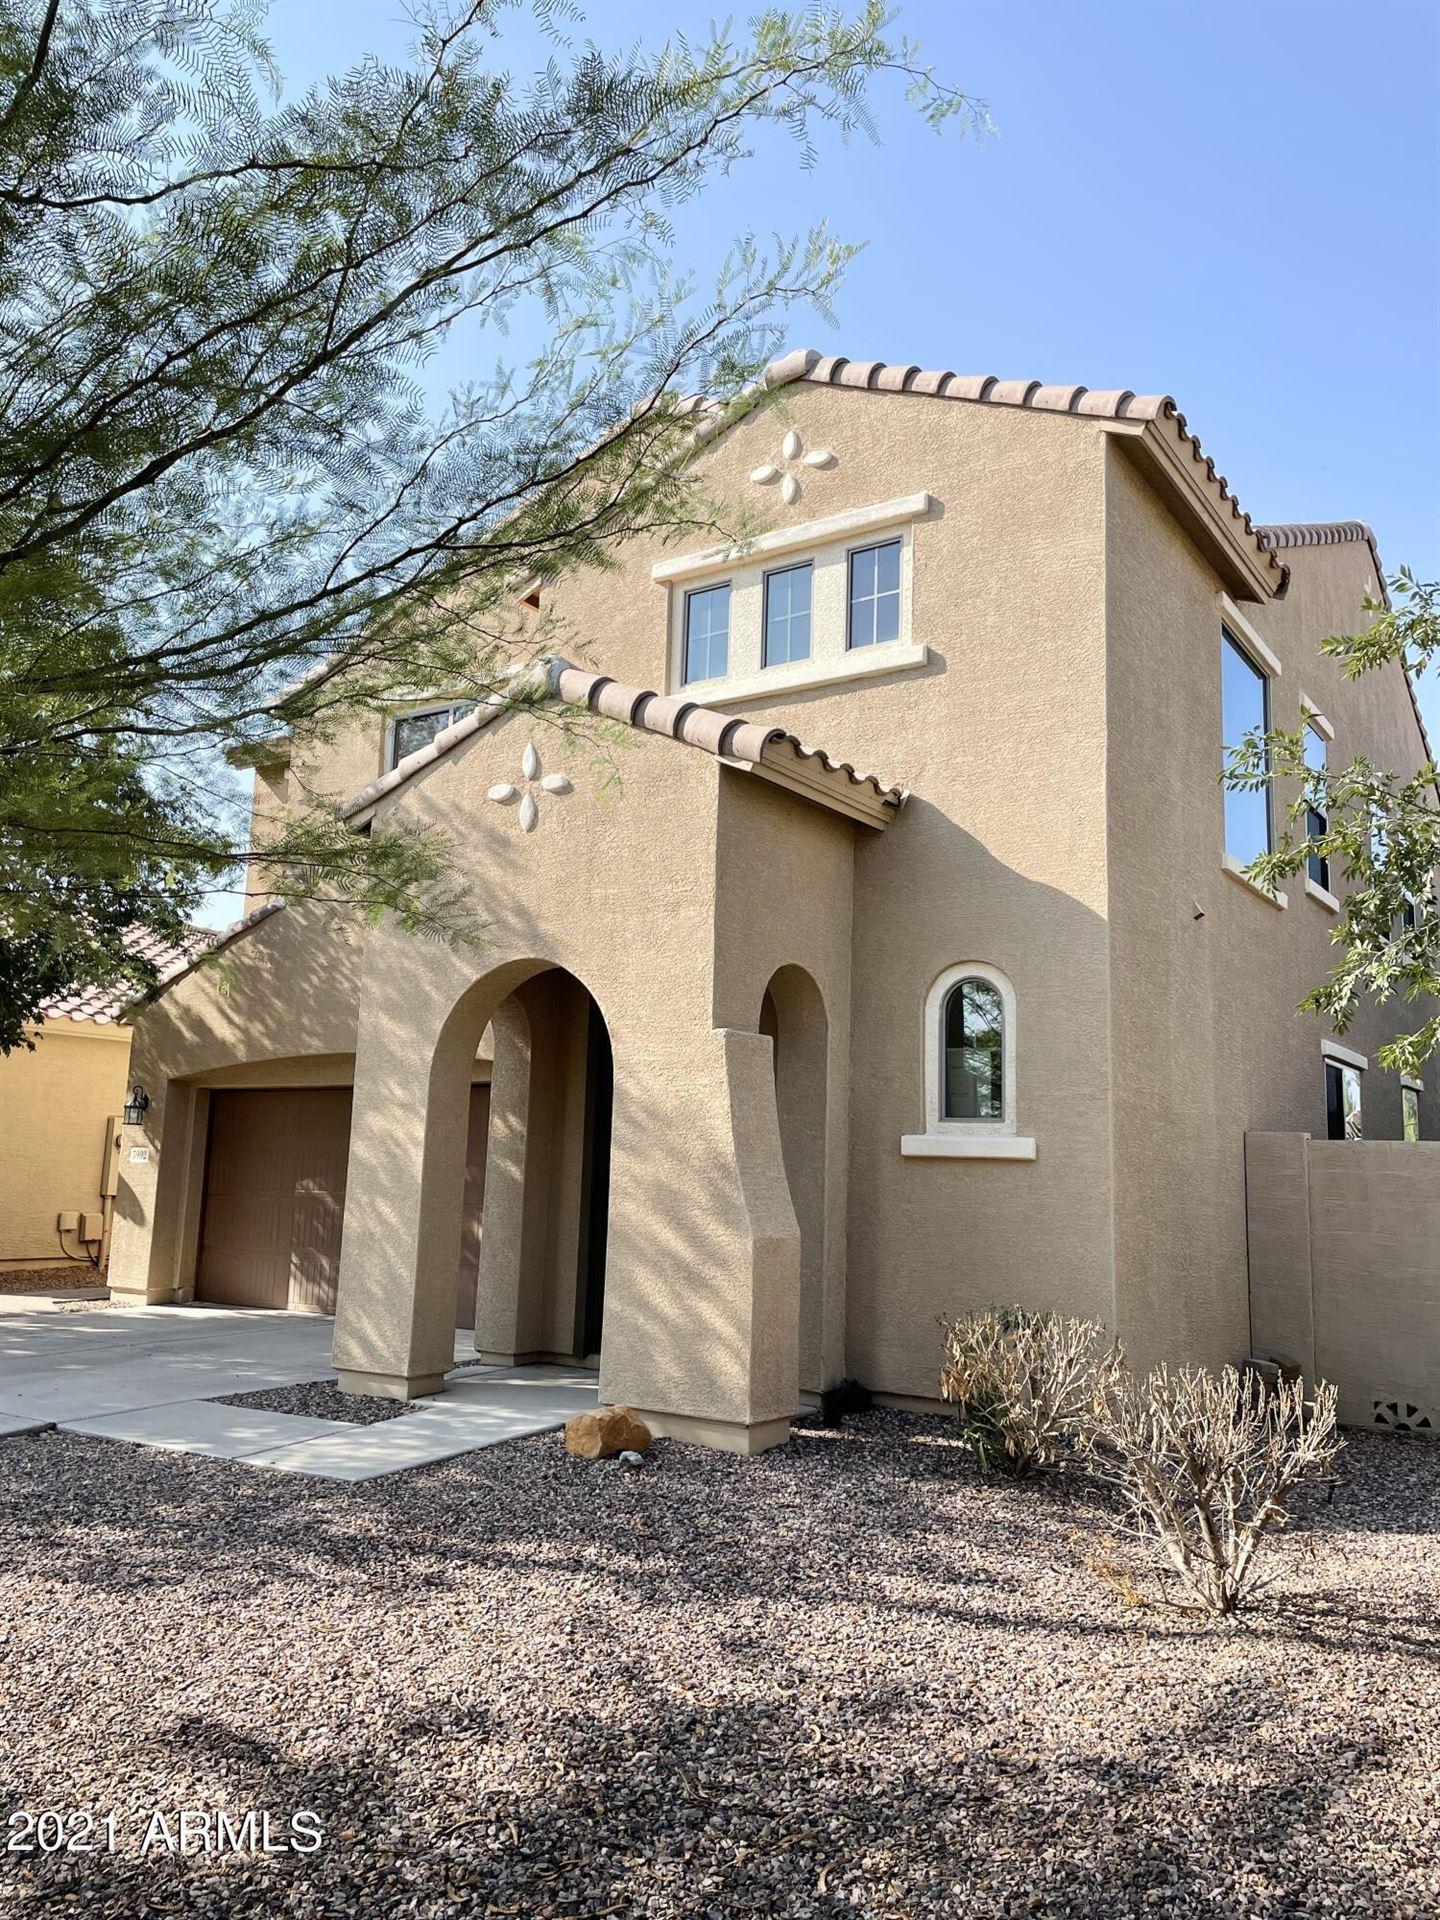 Photo of 3902 S STAR CANYON Drive, Gilbert, AZ 85297 (MLS # 6295635)